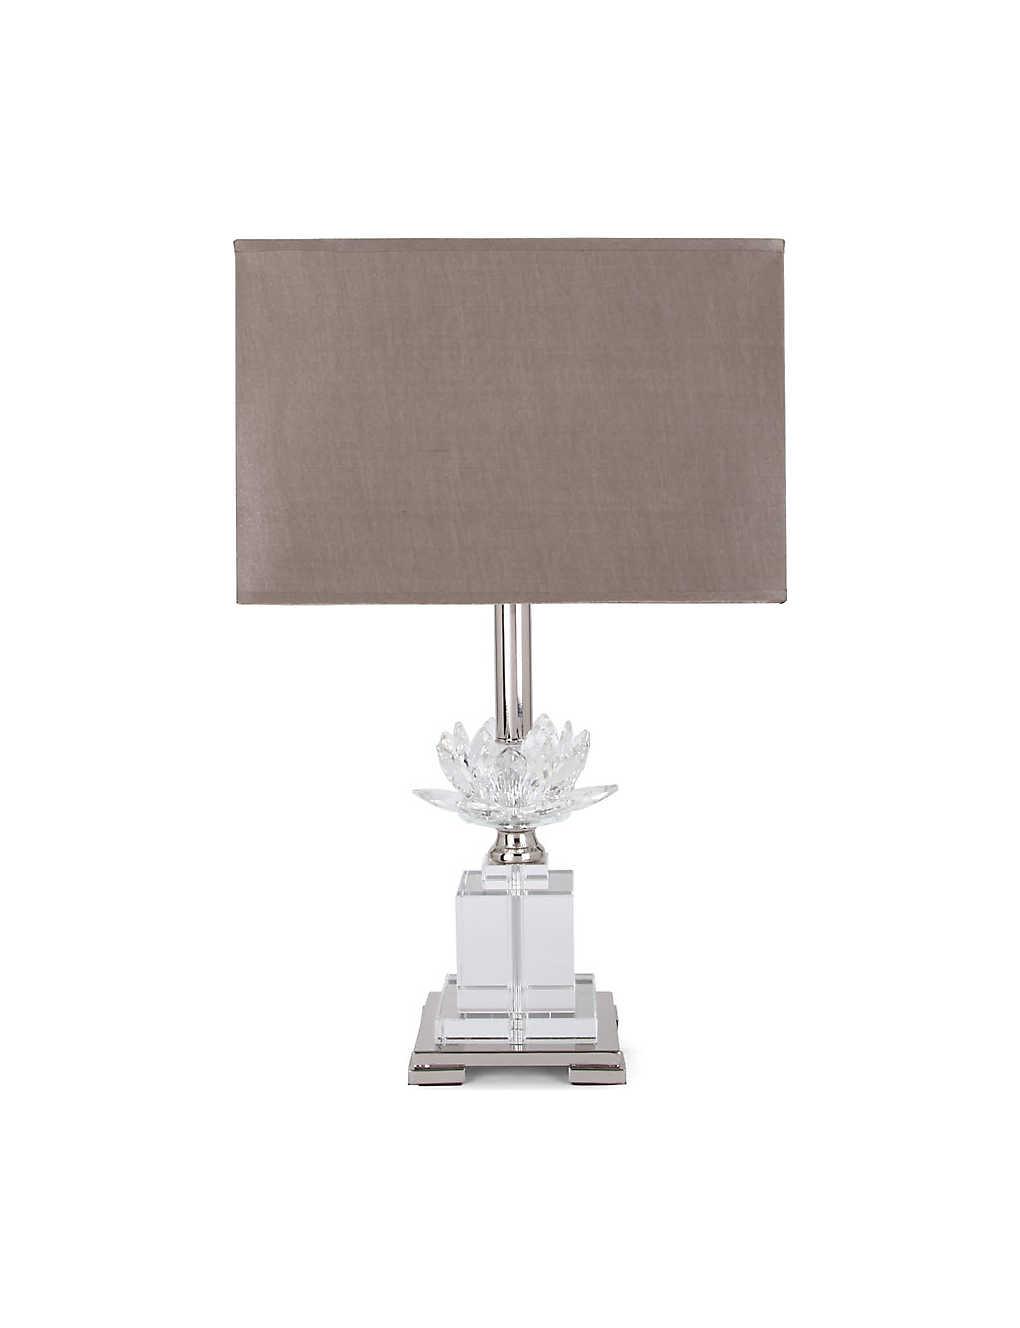 LIGHT SHOP Flower crystal table lamp |